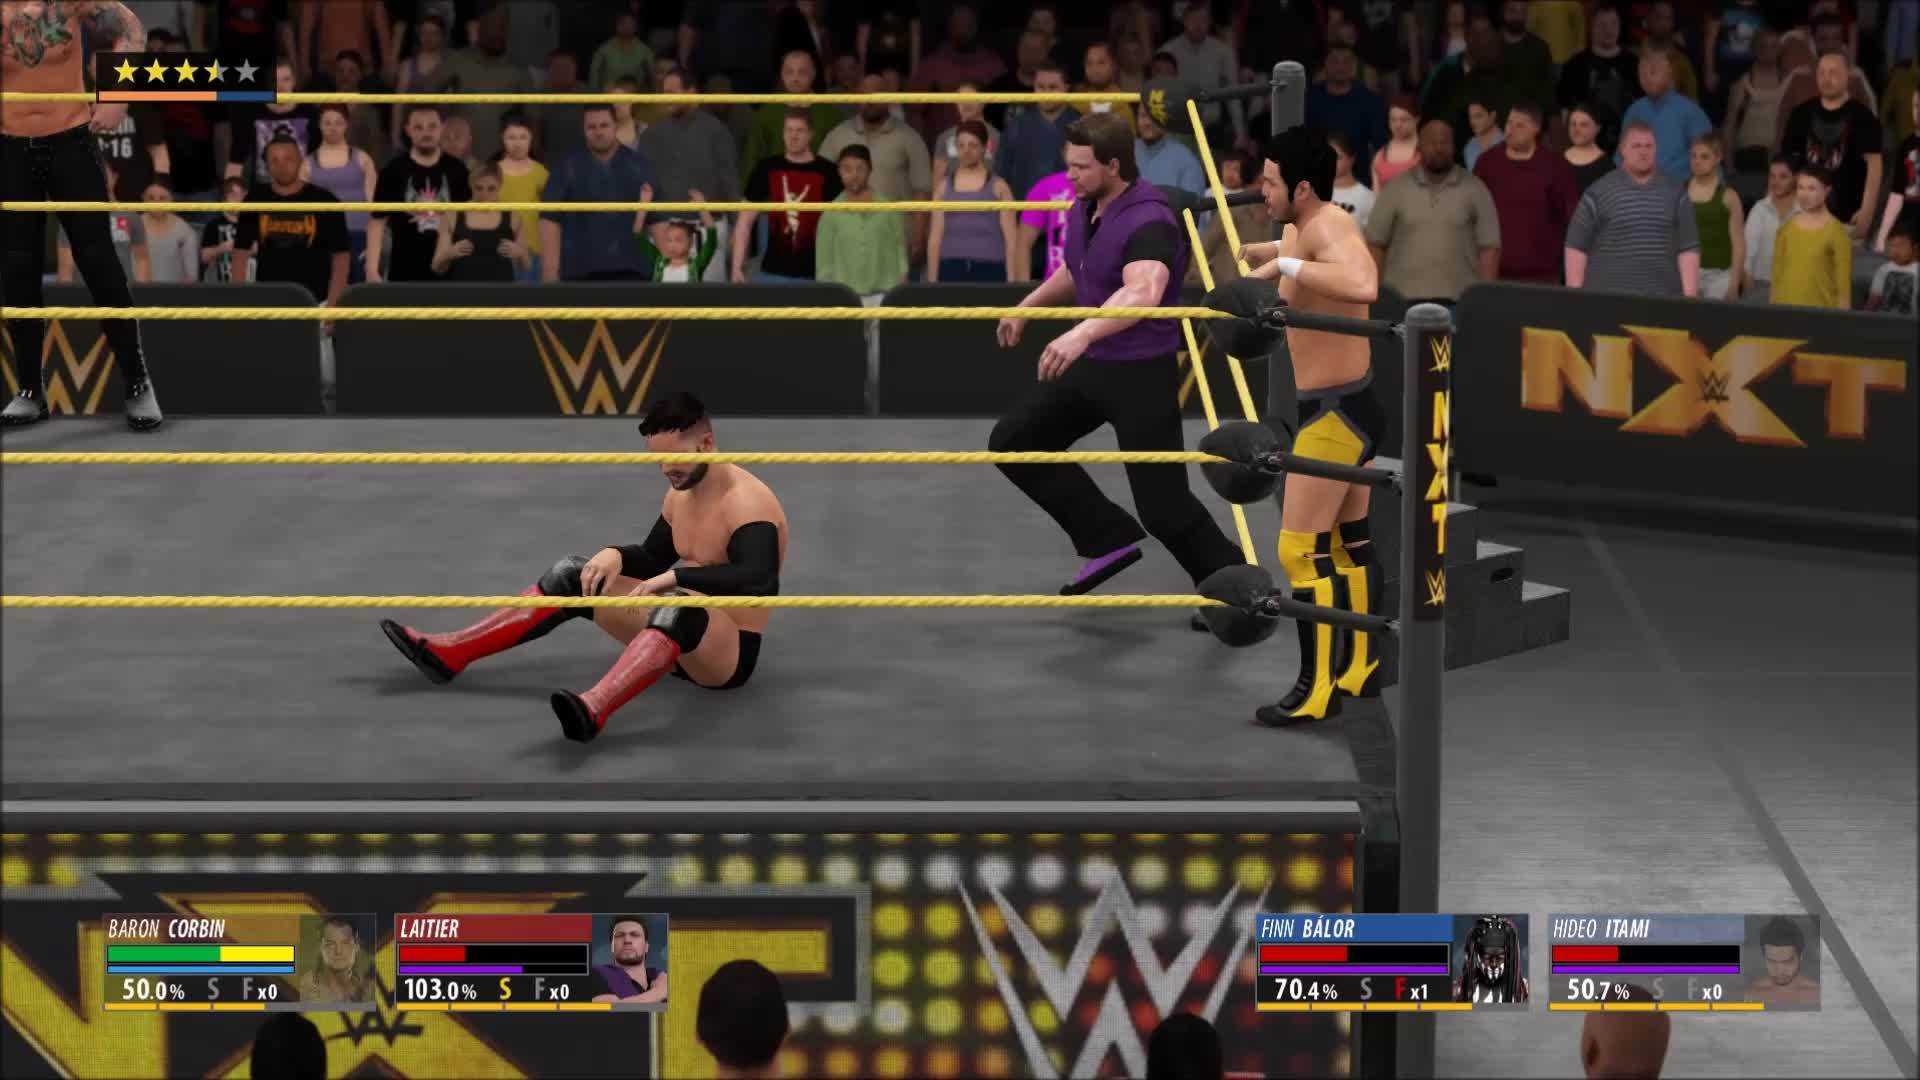 GamePhysics, gaming, [WWE 2K16] Finn Balor with a new evasive maneuver (reddit) GIFs